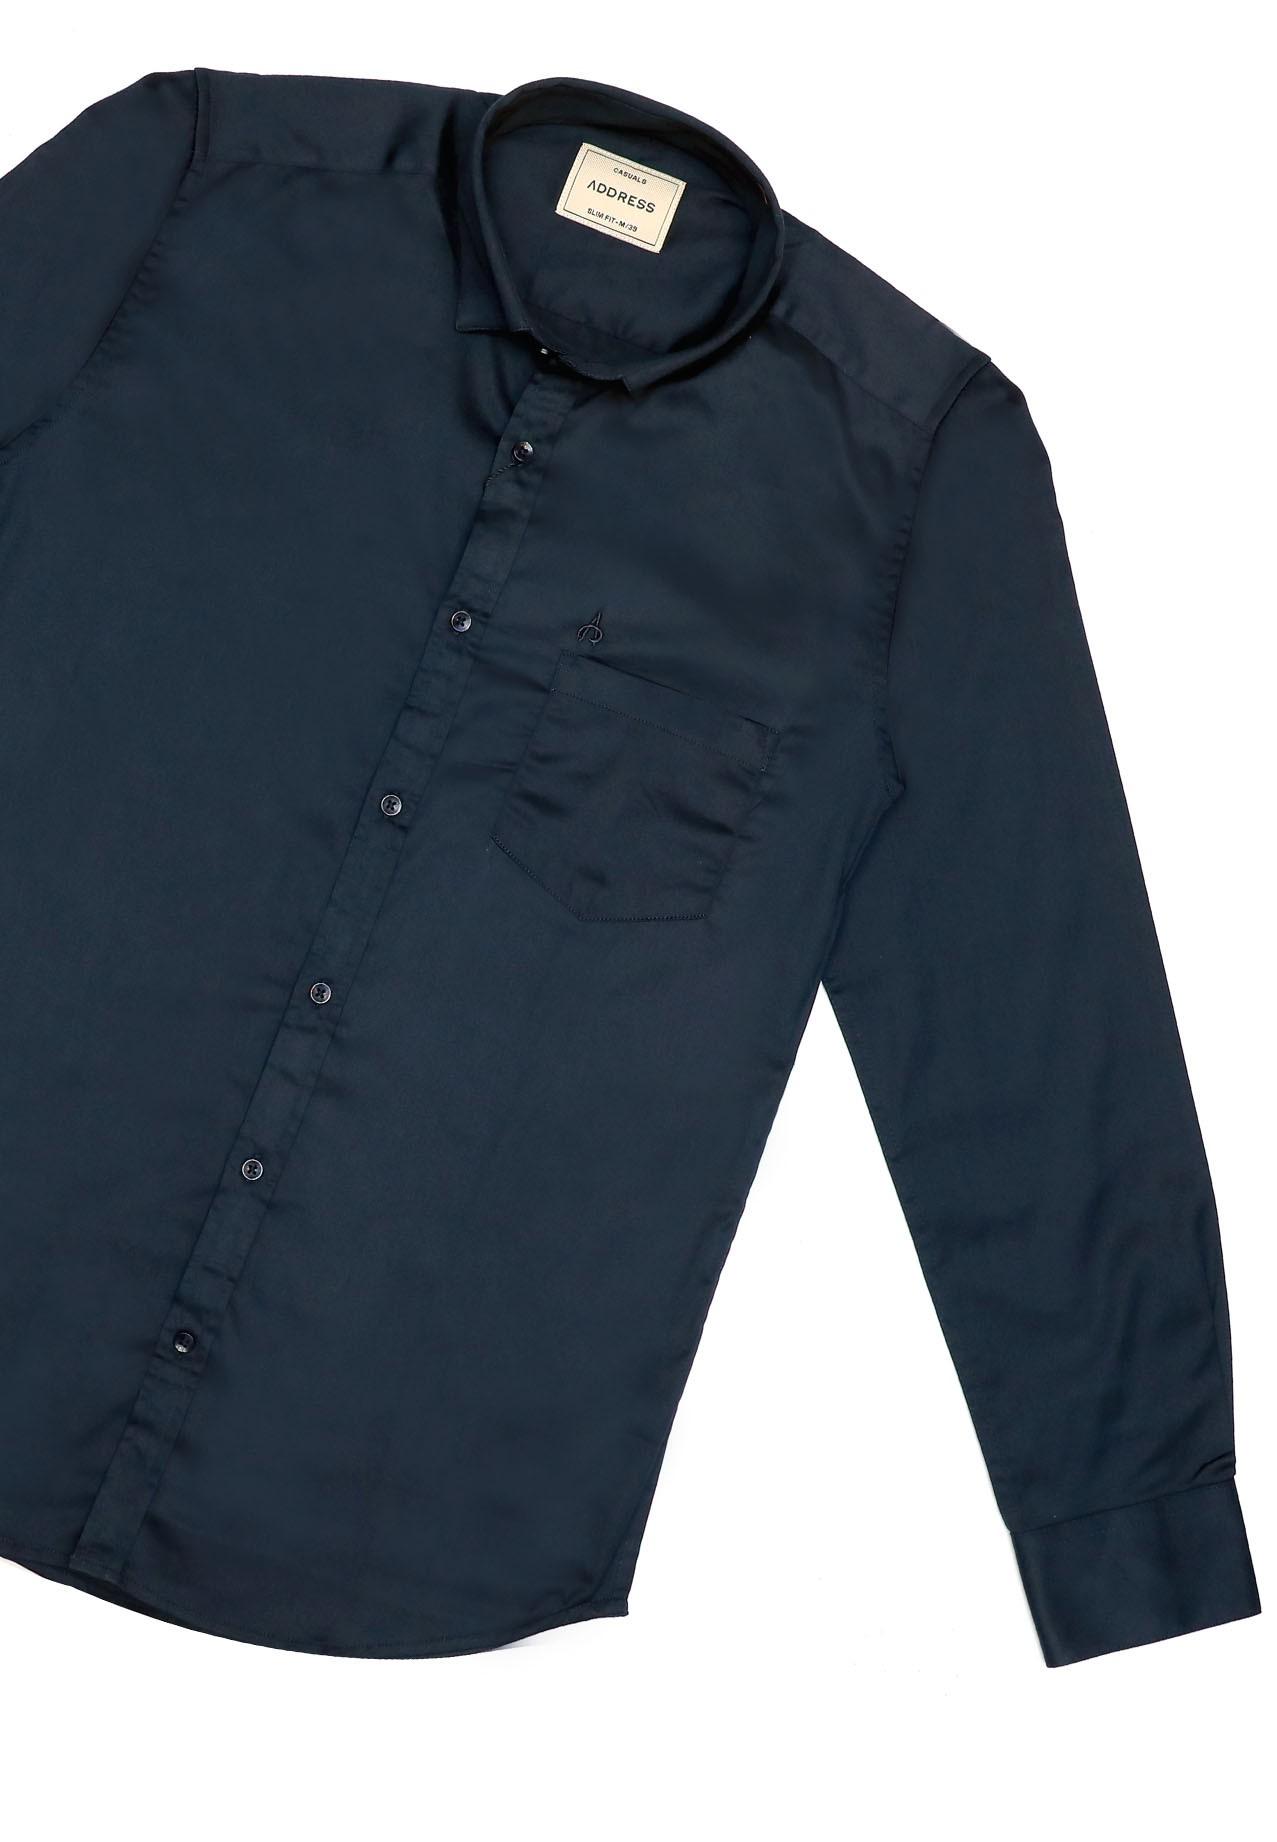 Address Formal Shirt Slim Fit, XL